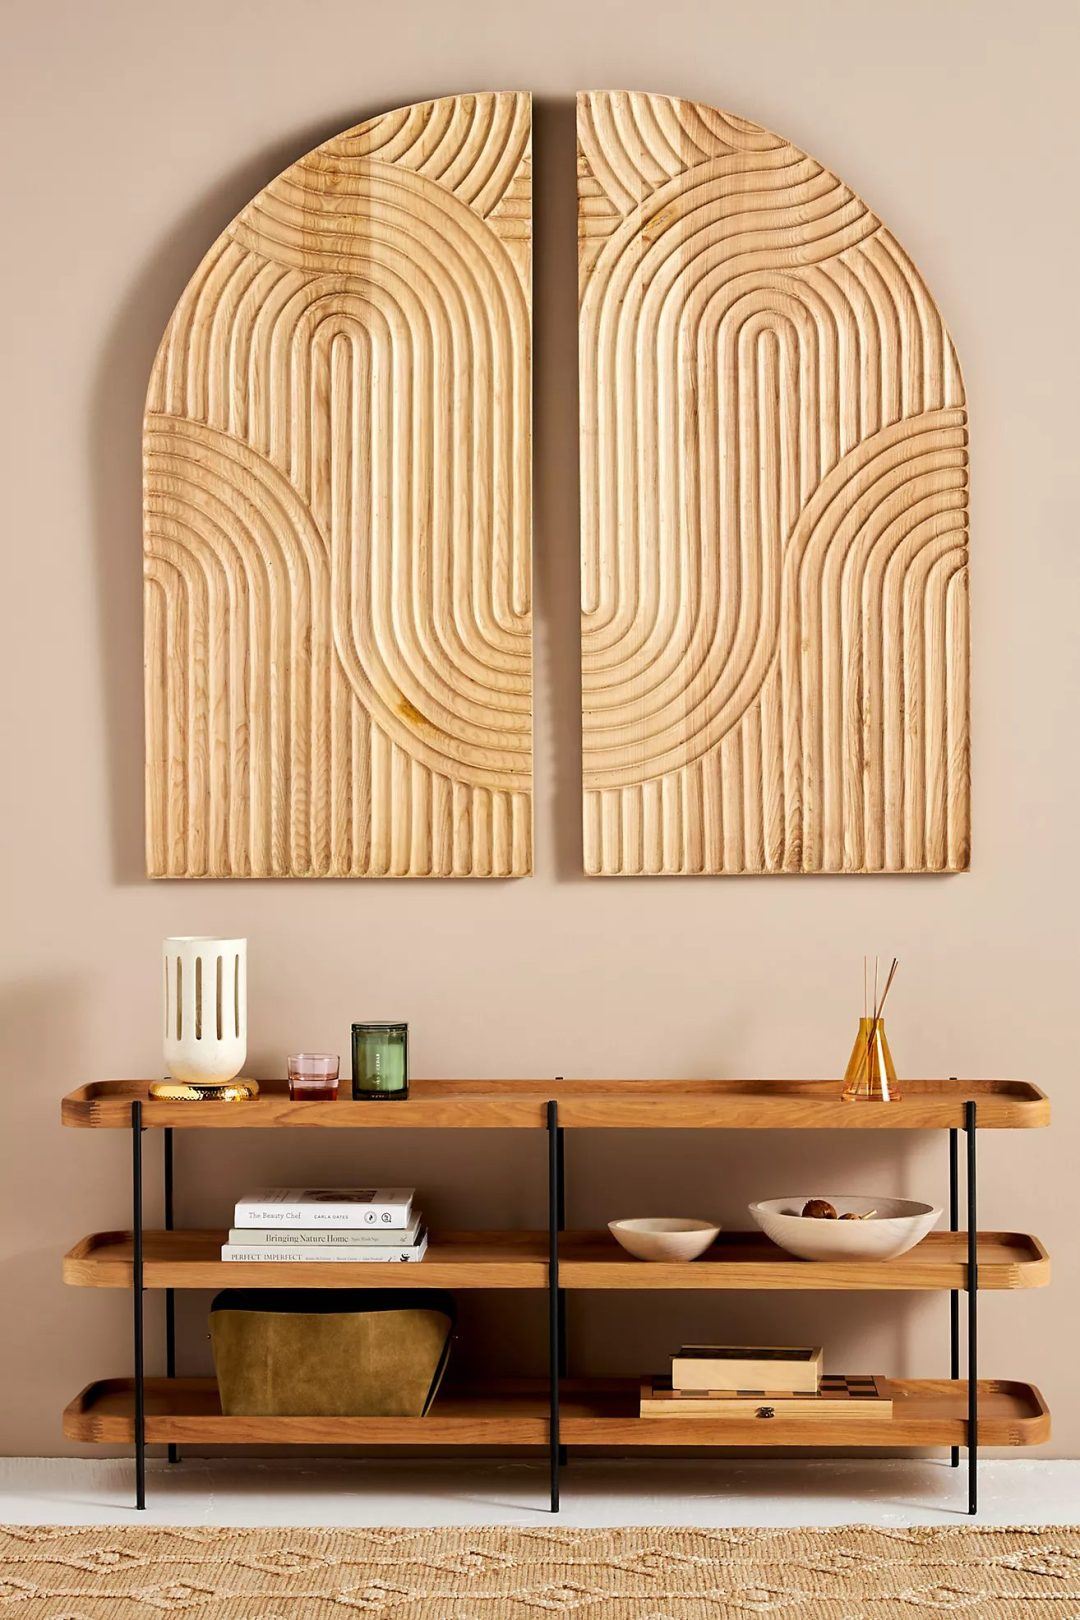 Big wooden bohemian wall art idea